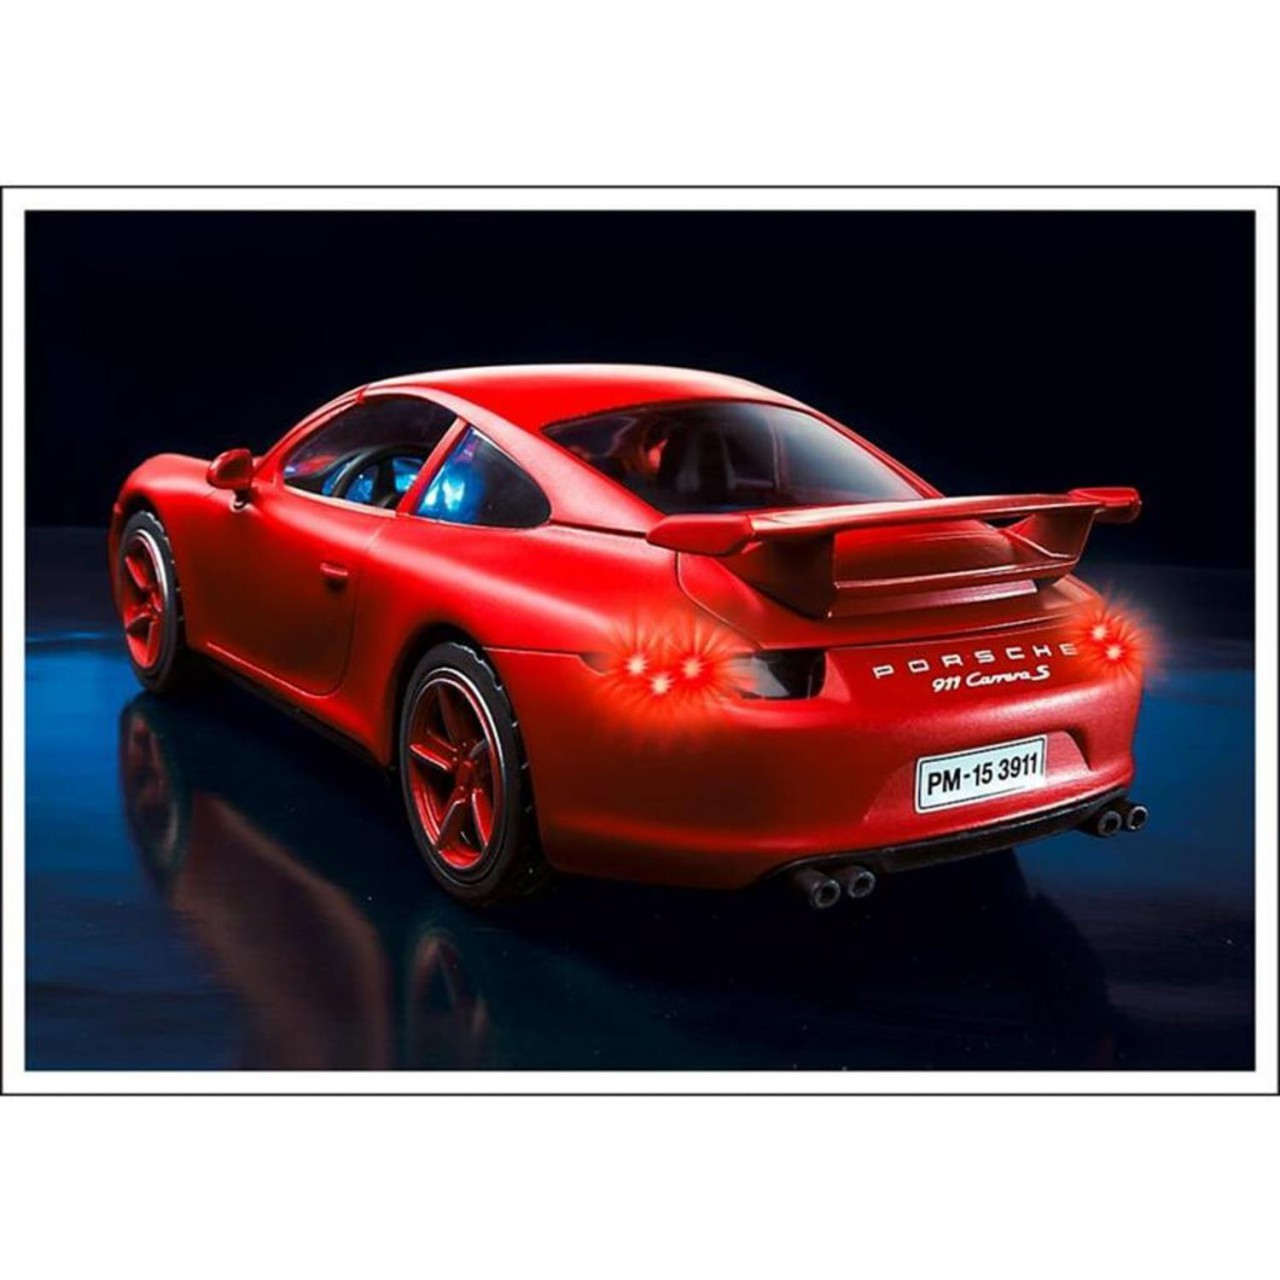 PLAYMOBIL 3911 Porsche 911 Carrera S Auto rot NEU OVP